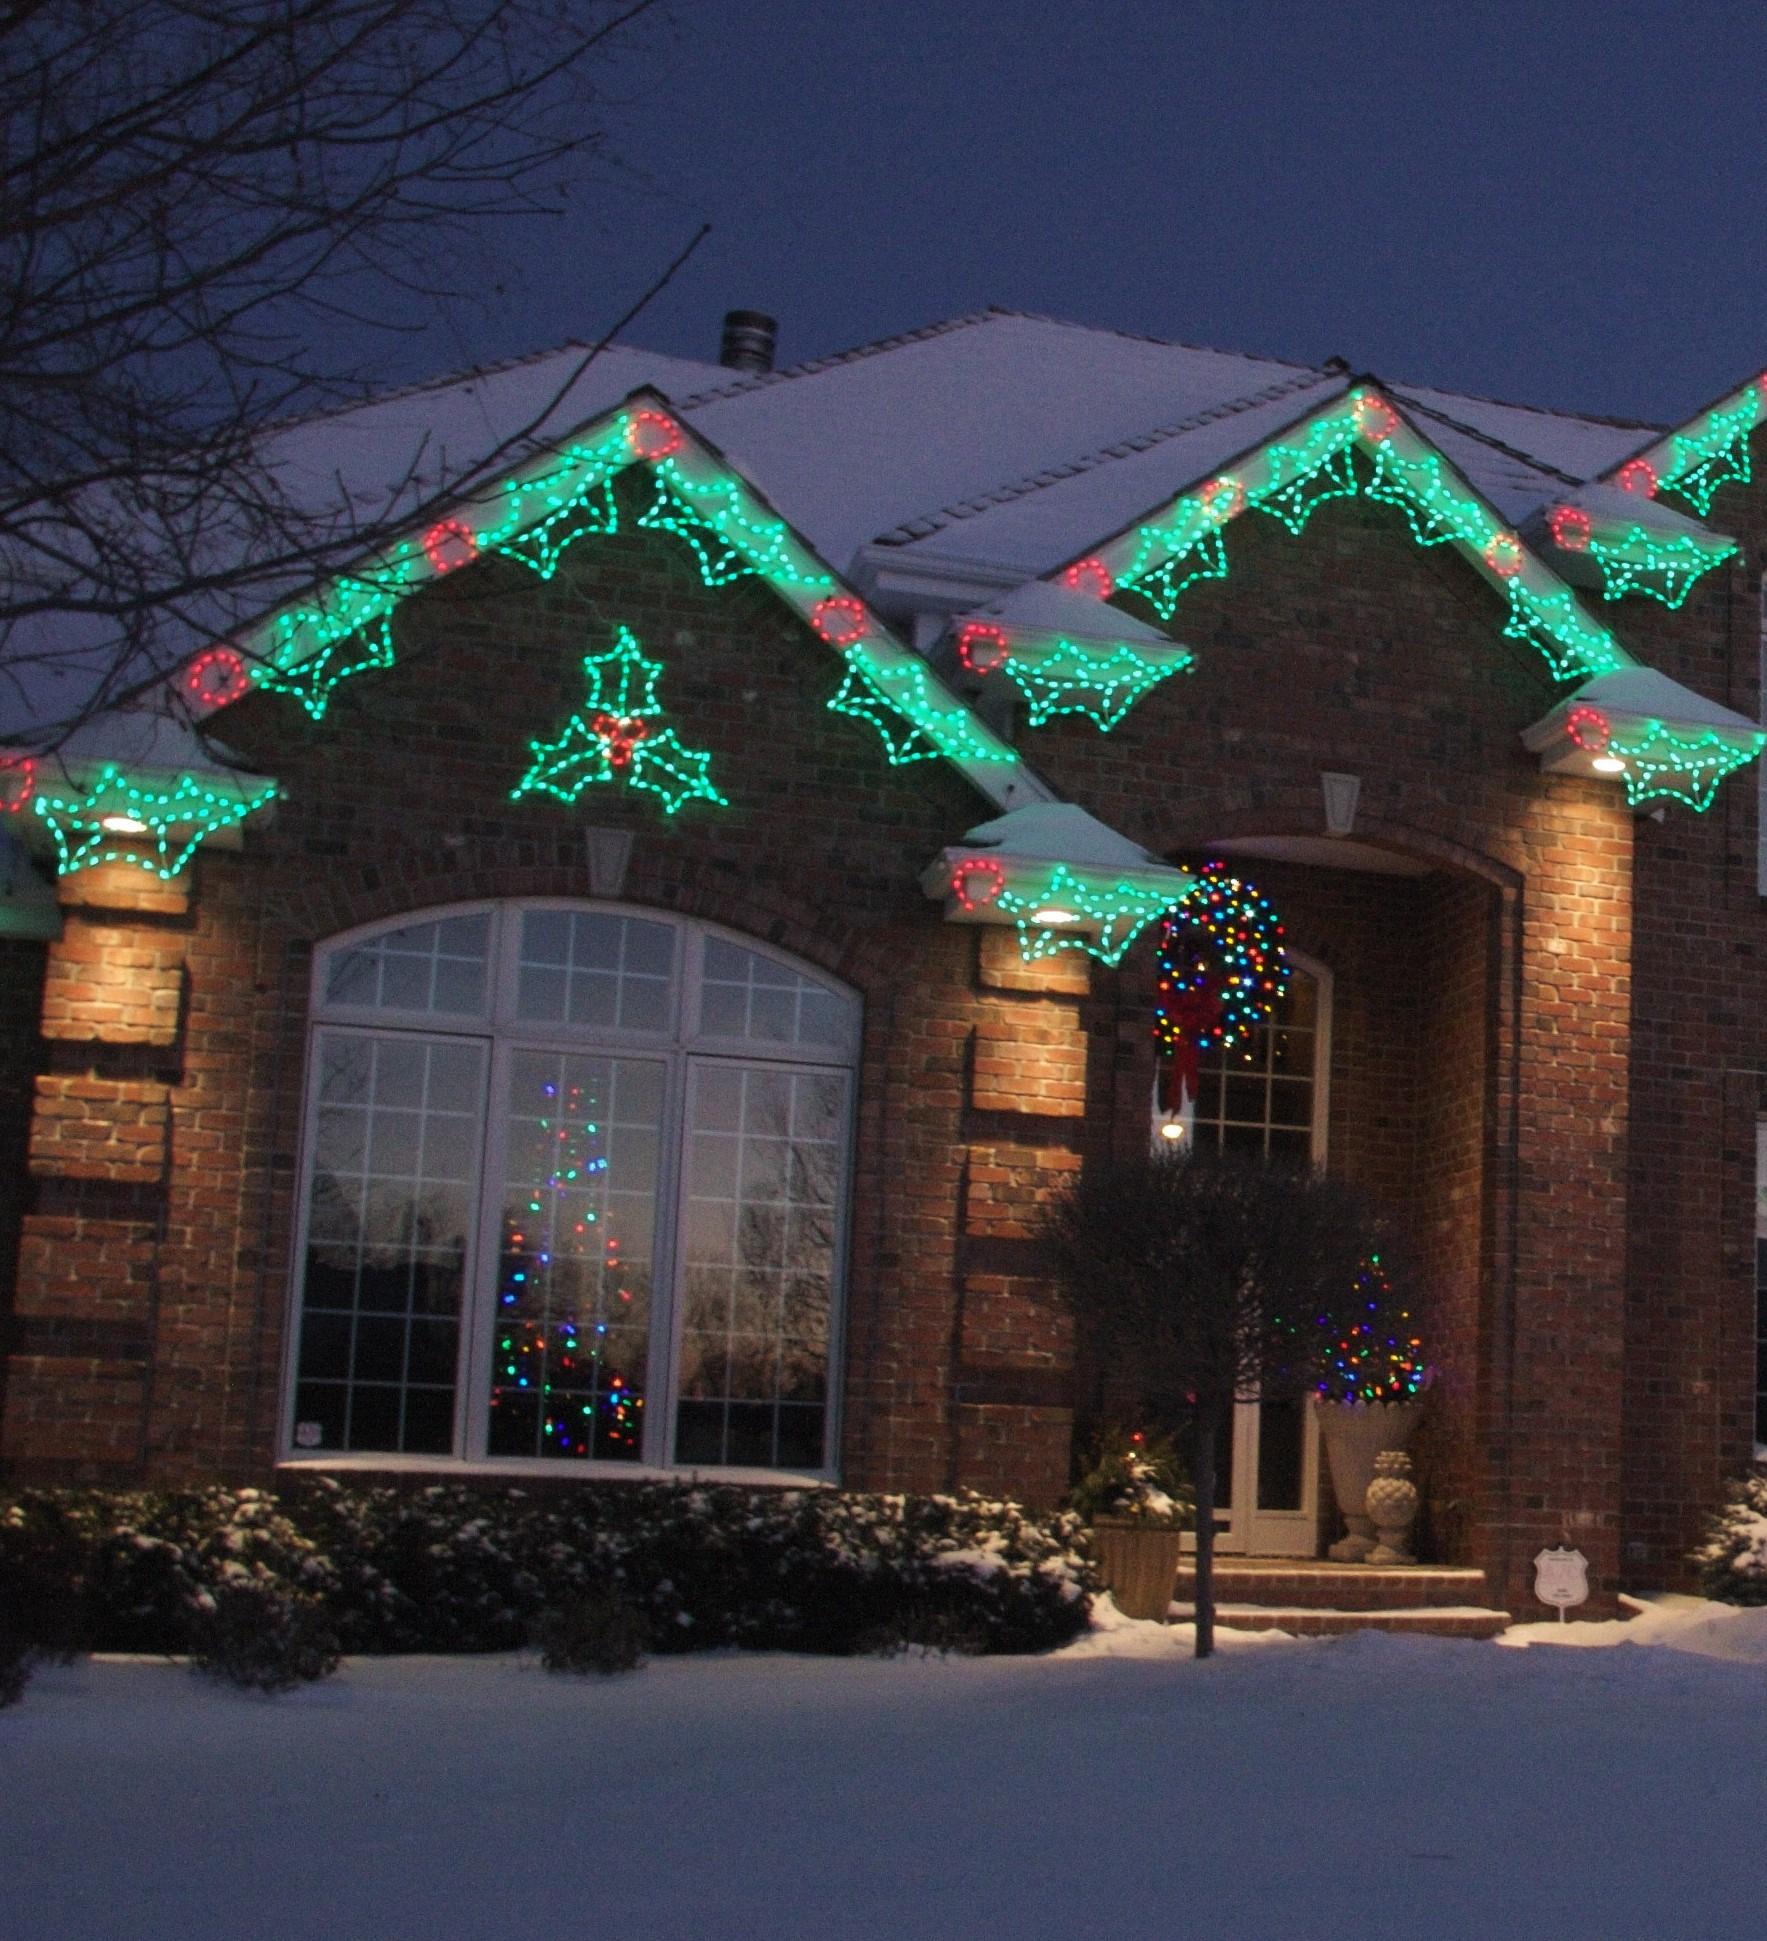 Lighting Colorado Springs: Christmas Lights No Outdoor Plug • Christmas Lights Ideas